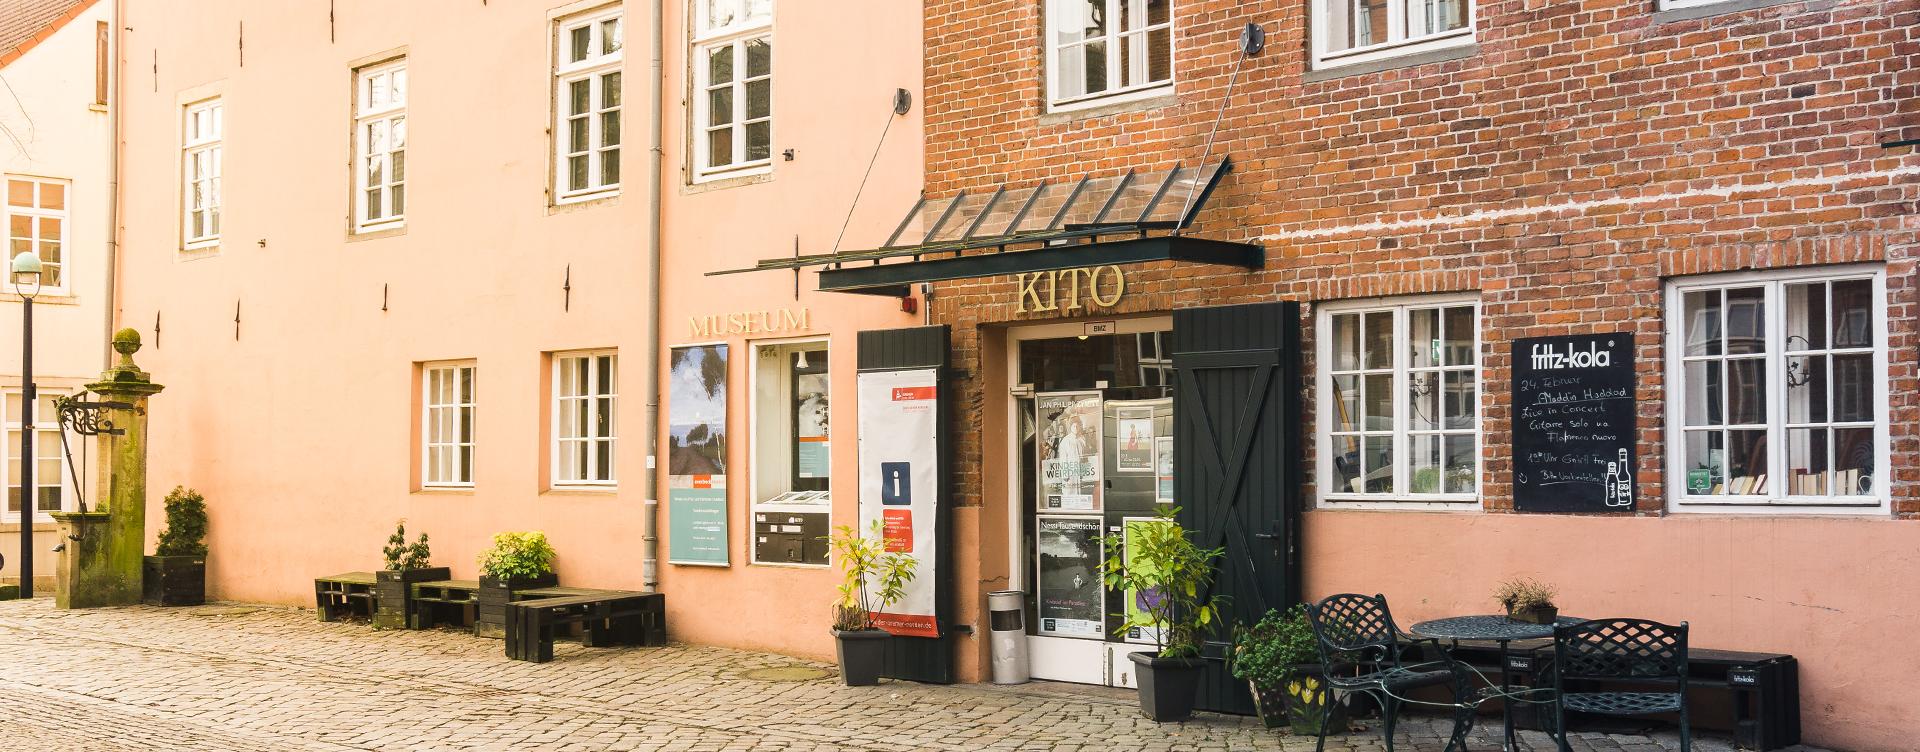 KITO - vegesack.de